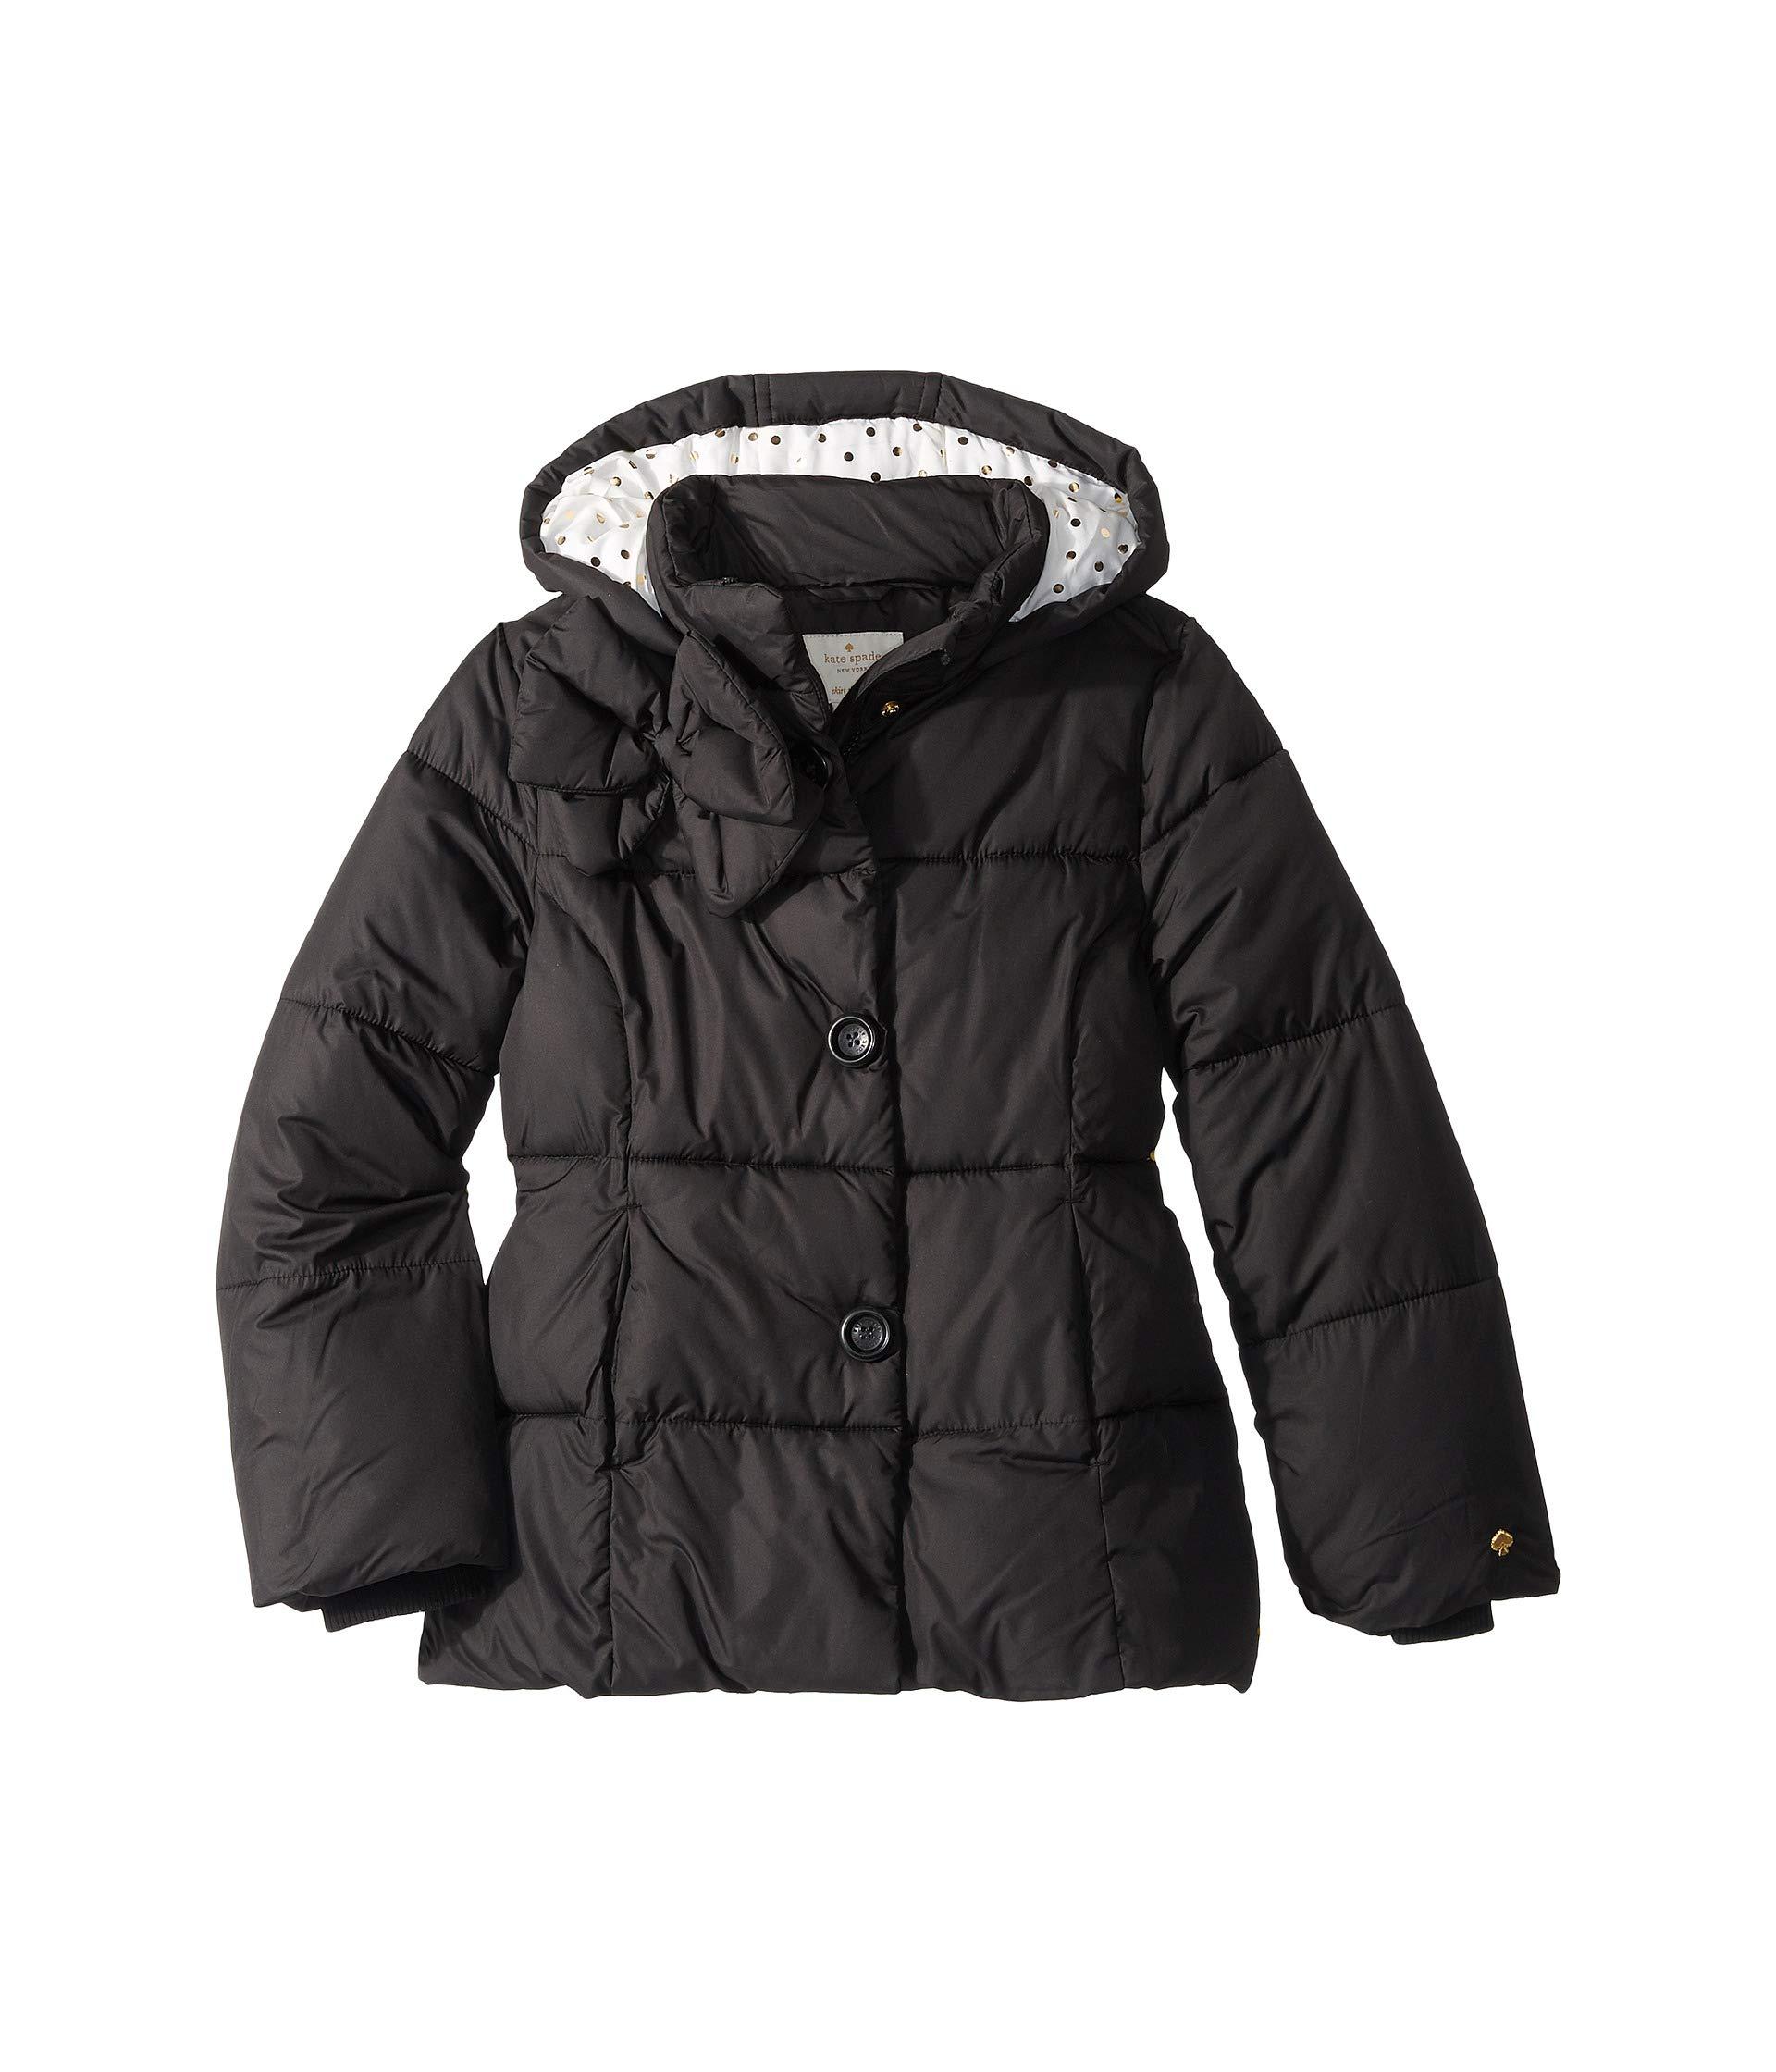 fa55f25a2c11 Kate Spade New York Kids Bow Puffer Coat (Little Kids Big Kids) at ...